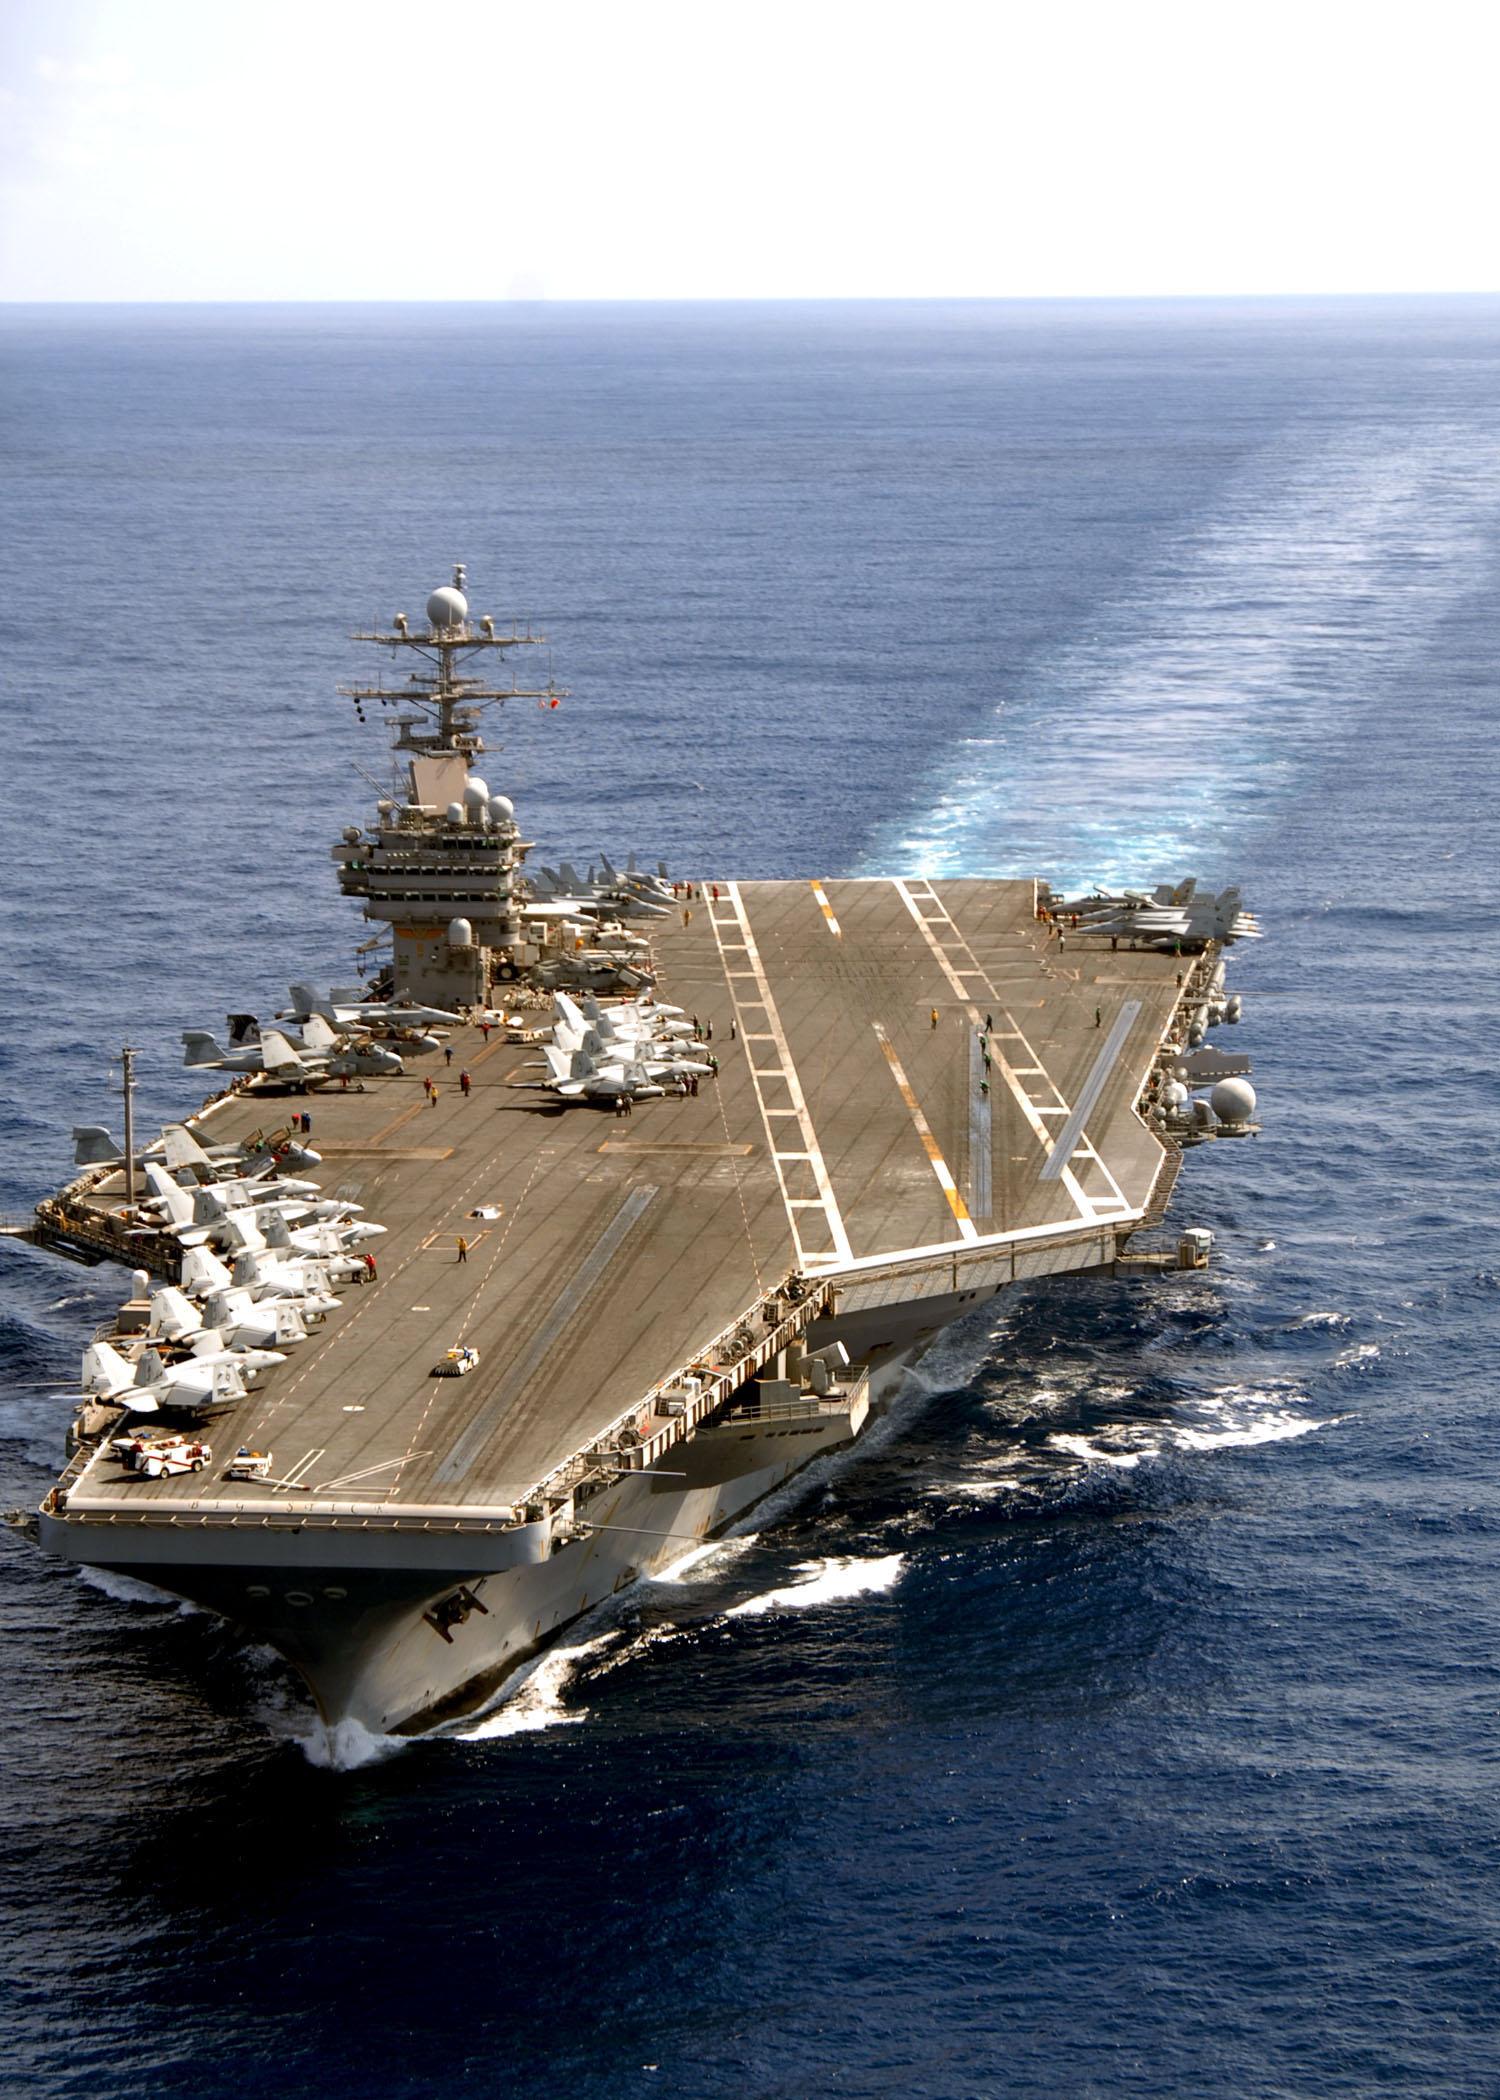 Uss Nimitz Size Comparison USS Theodore Roosevelt...